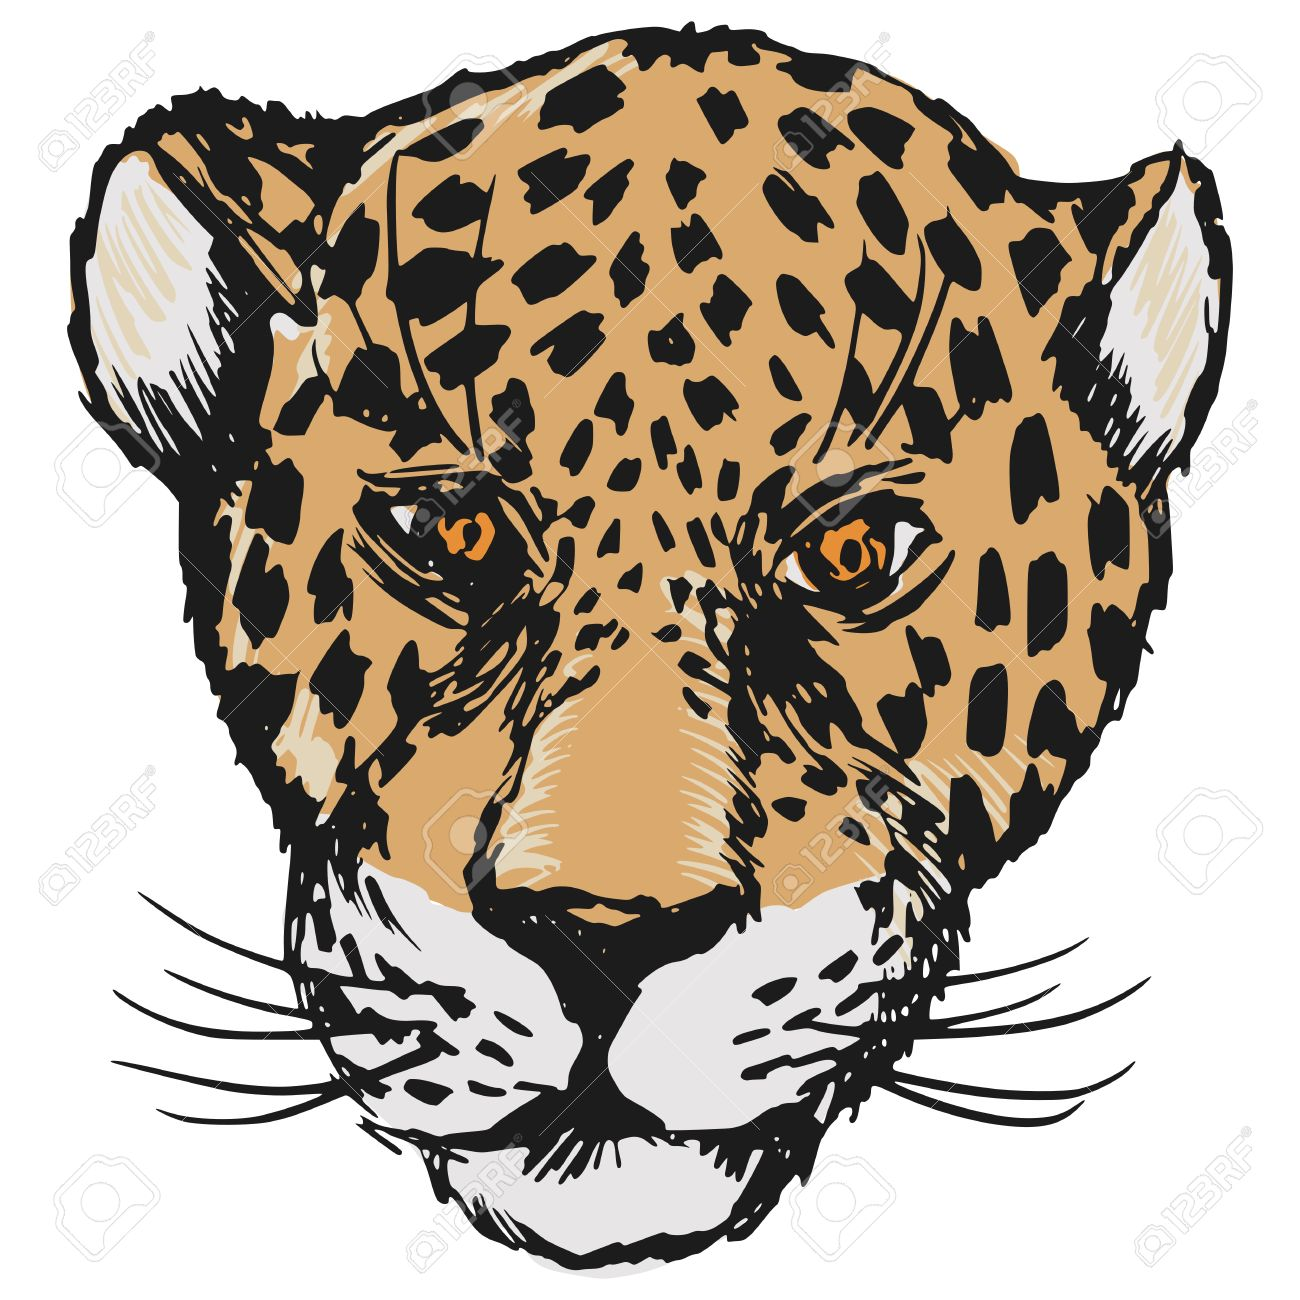 Hand Drawn Sketch Cartoon Illustration Of Jaguar Royalty Free